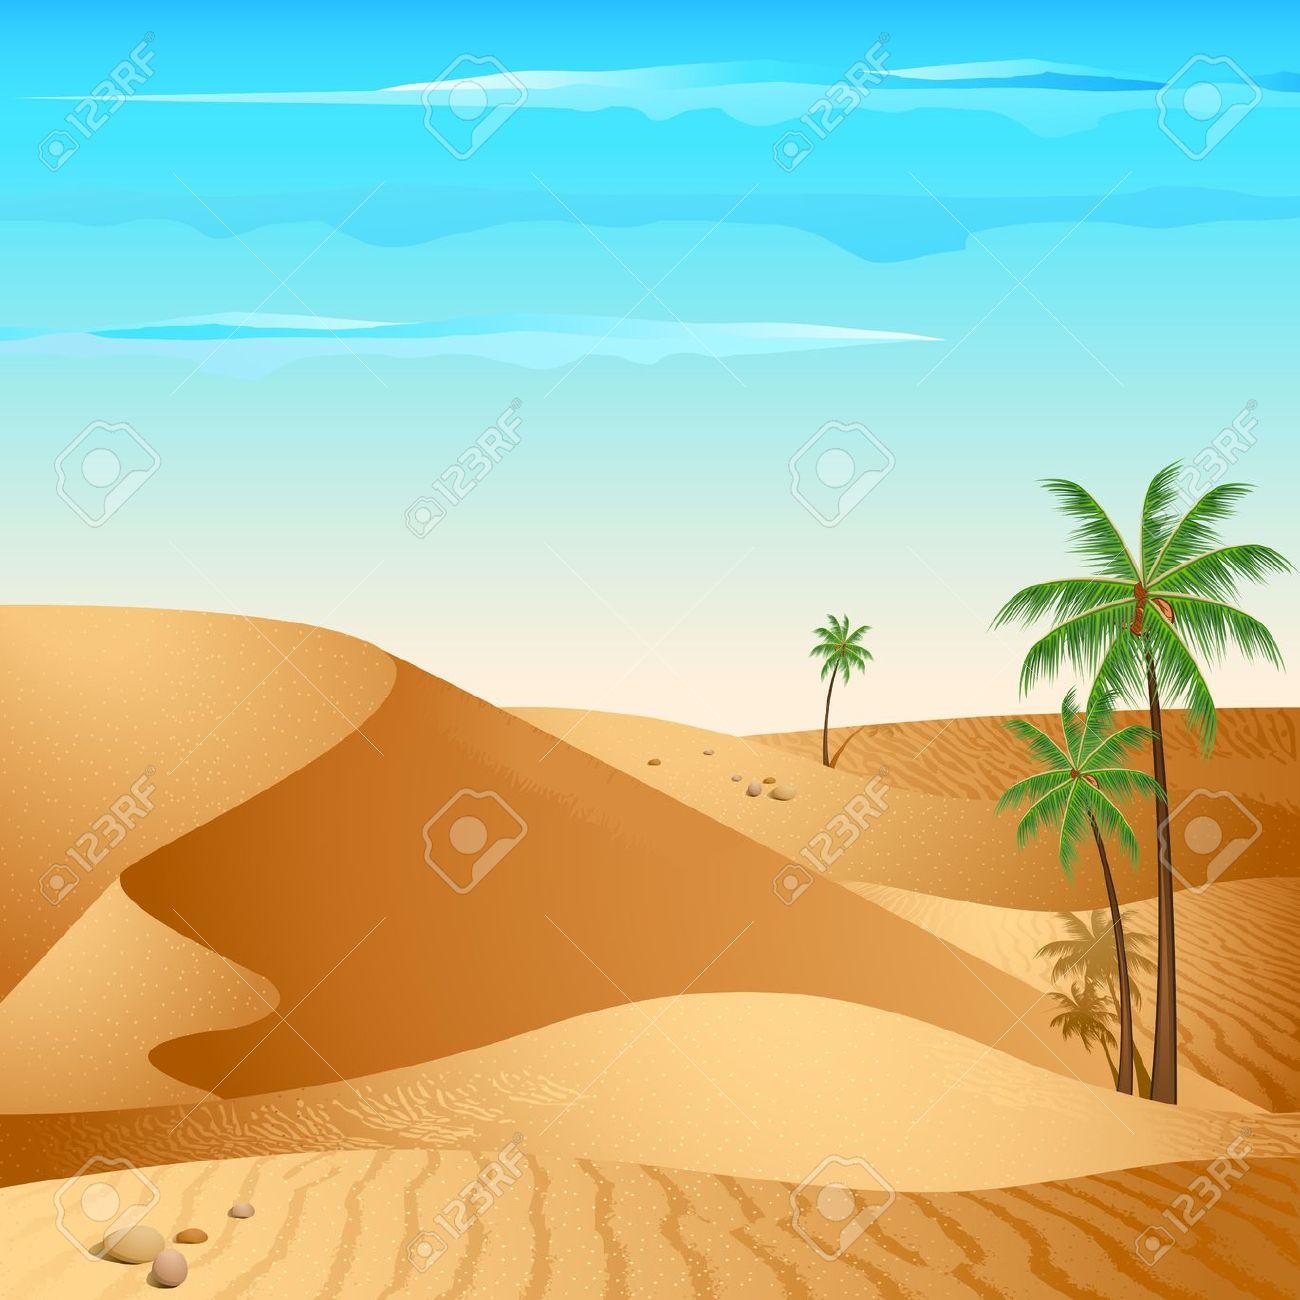 Dune clipart #18, Download drawings